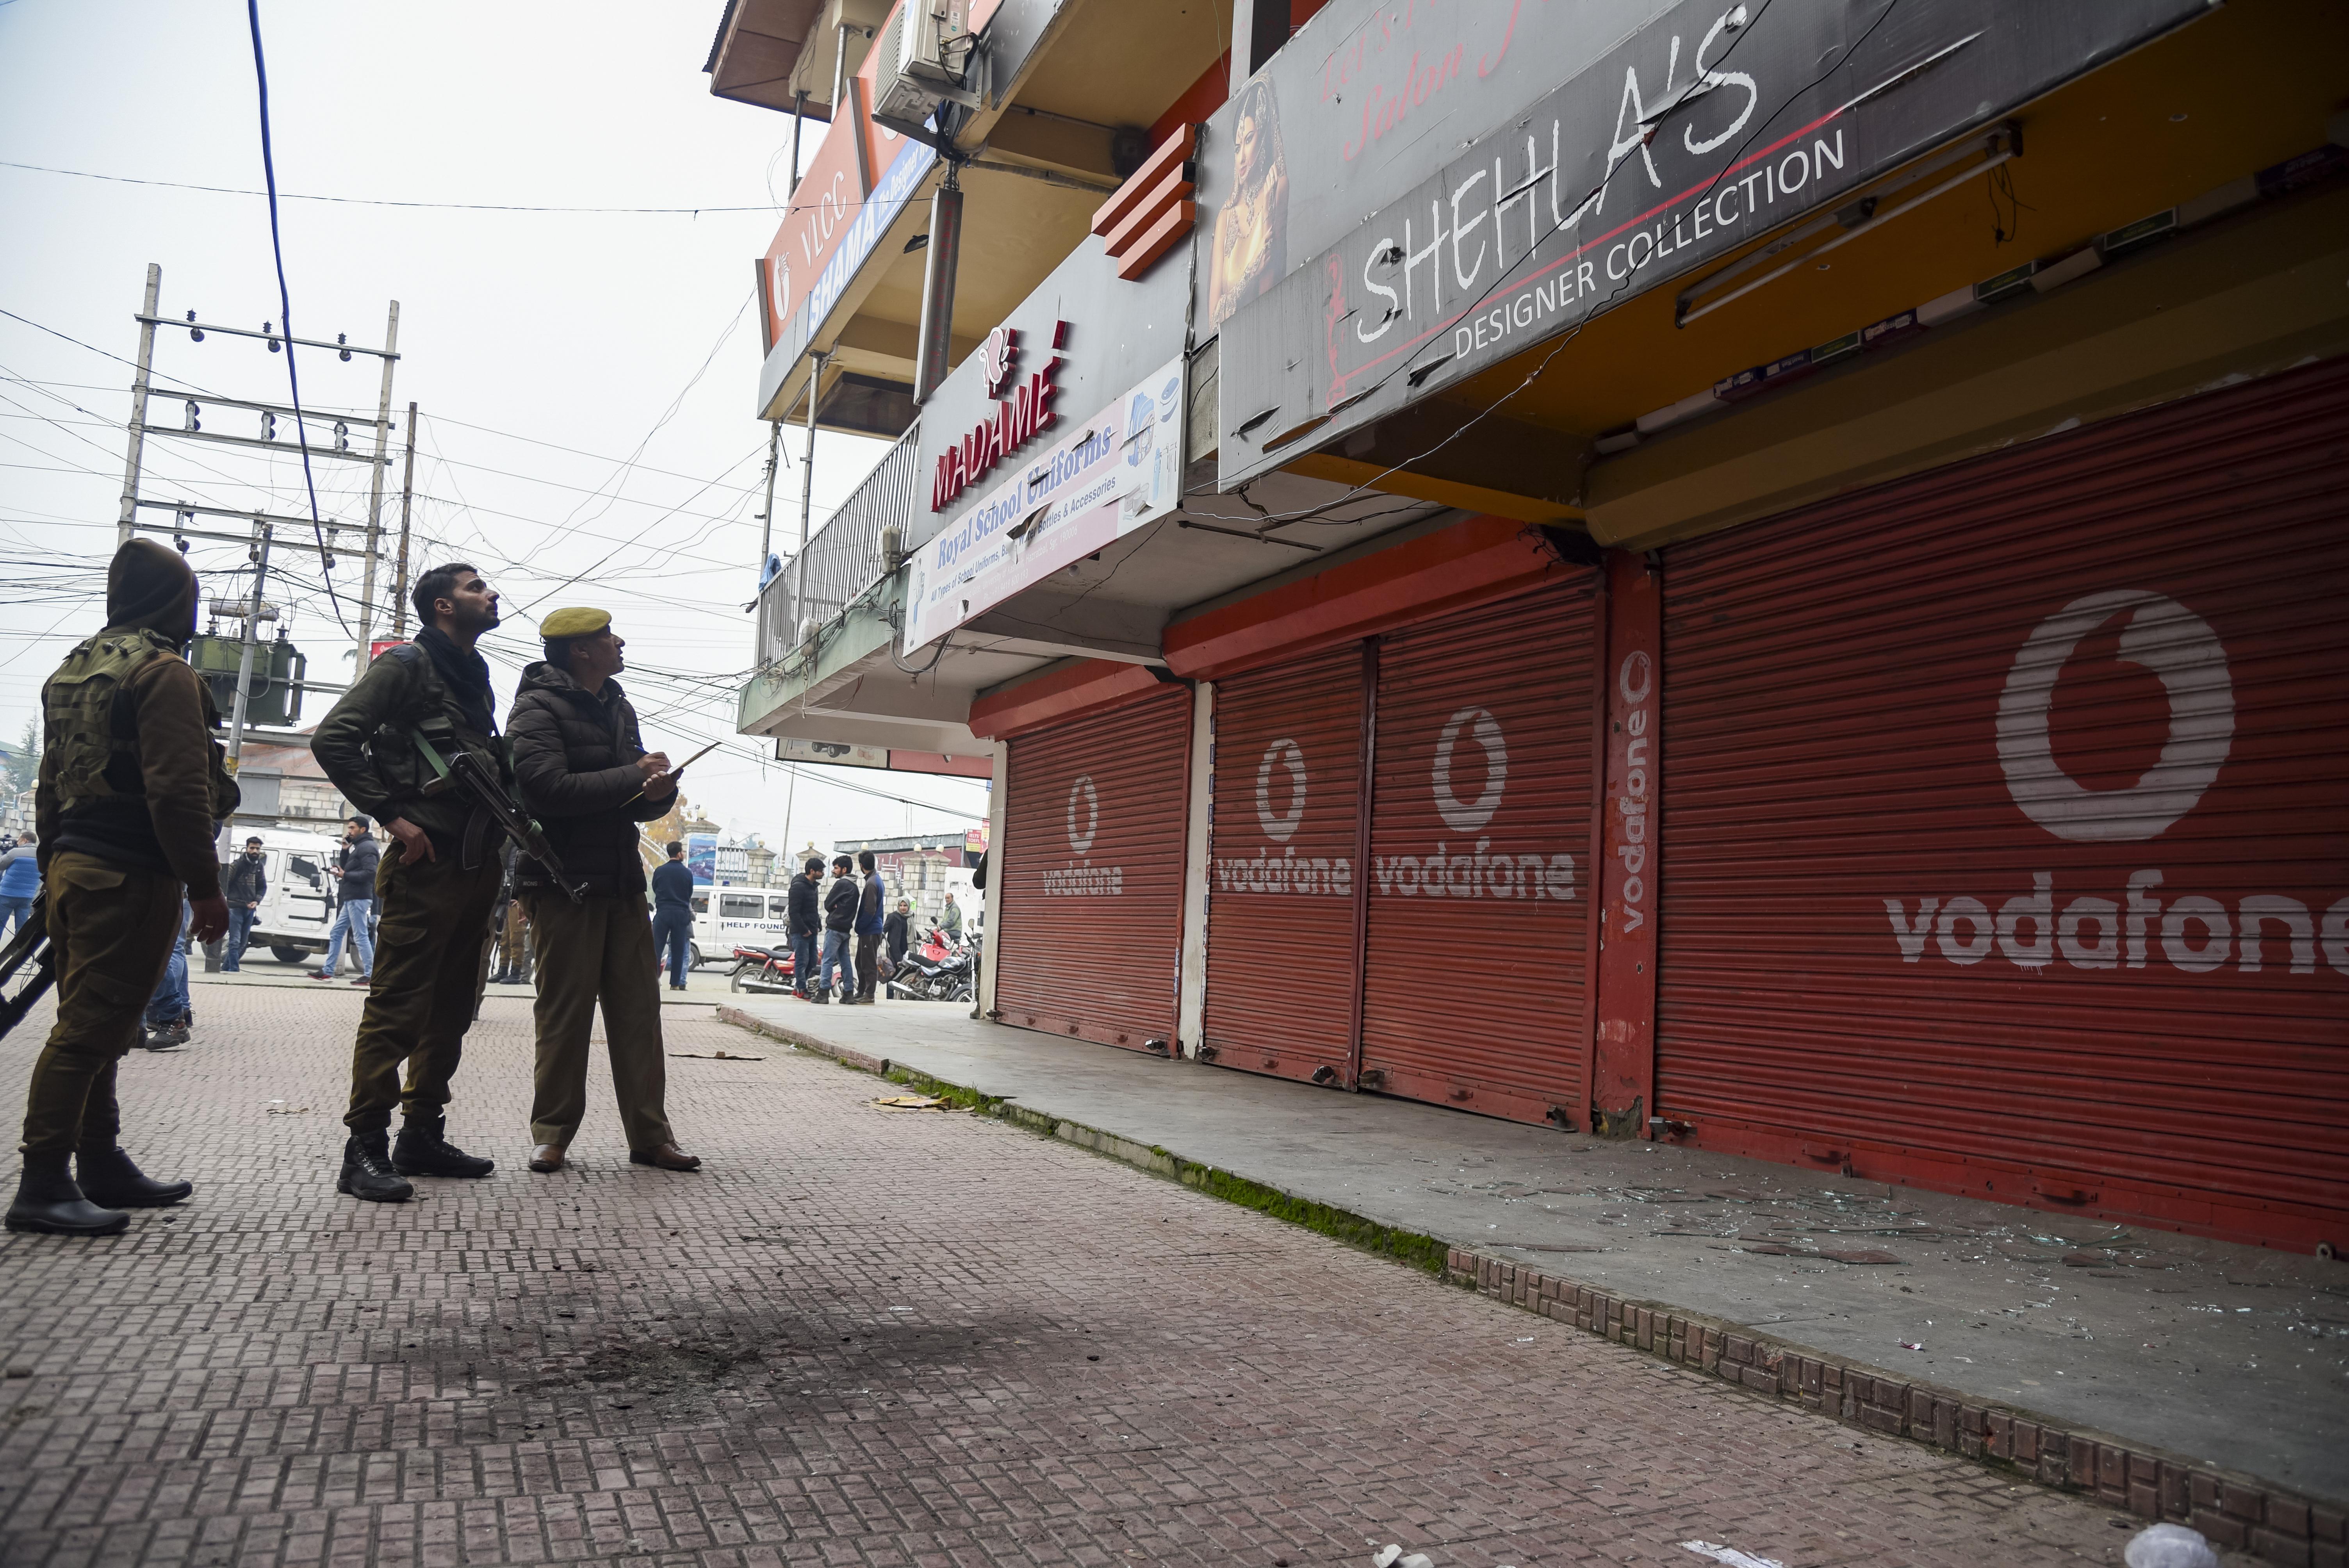 3 Injured in a blast in Srinagar, India